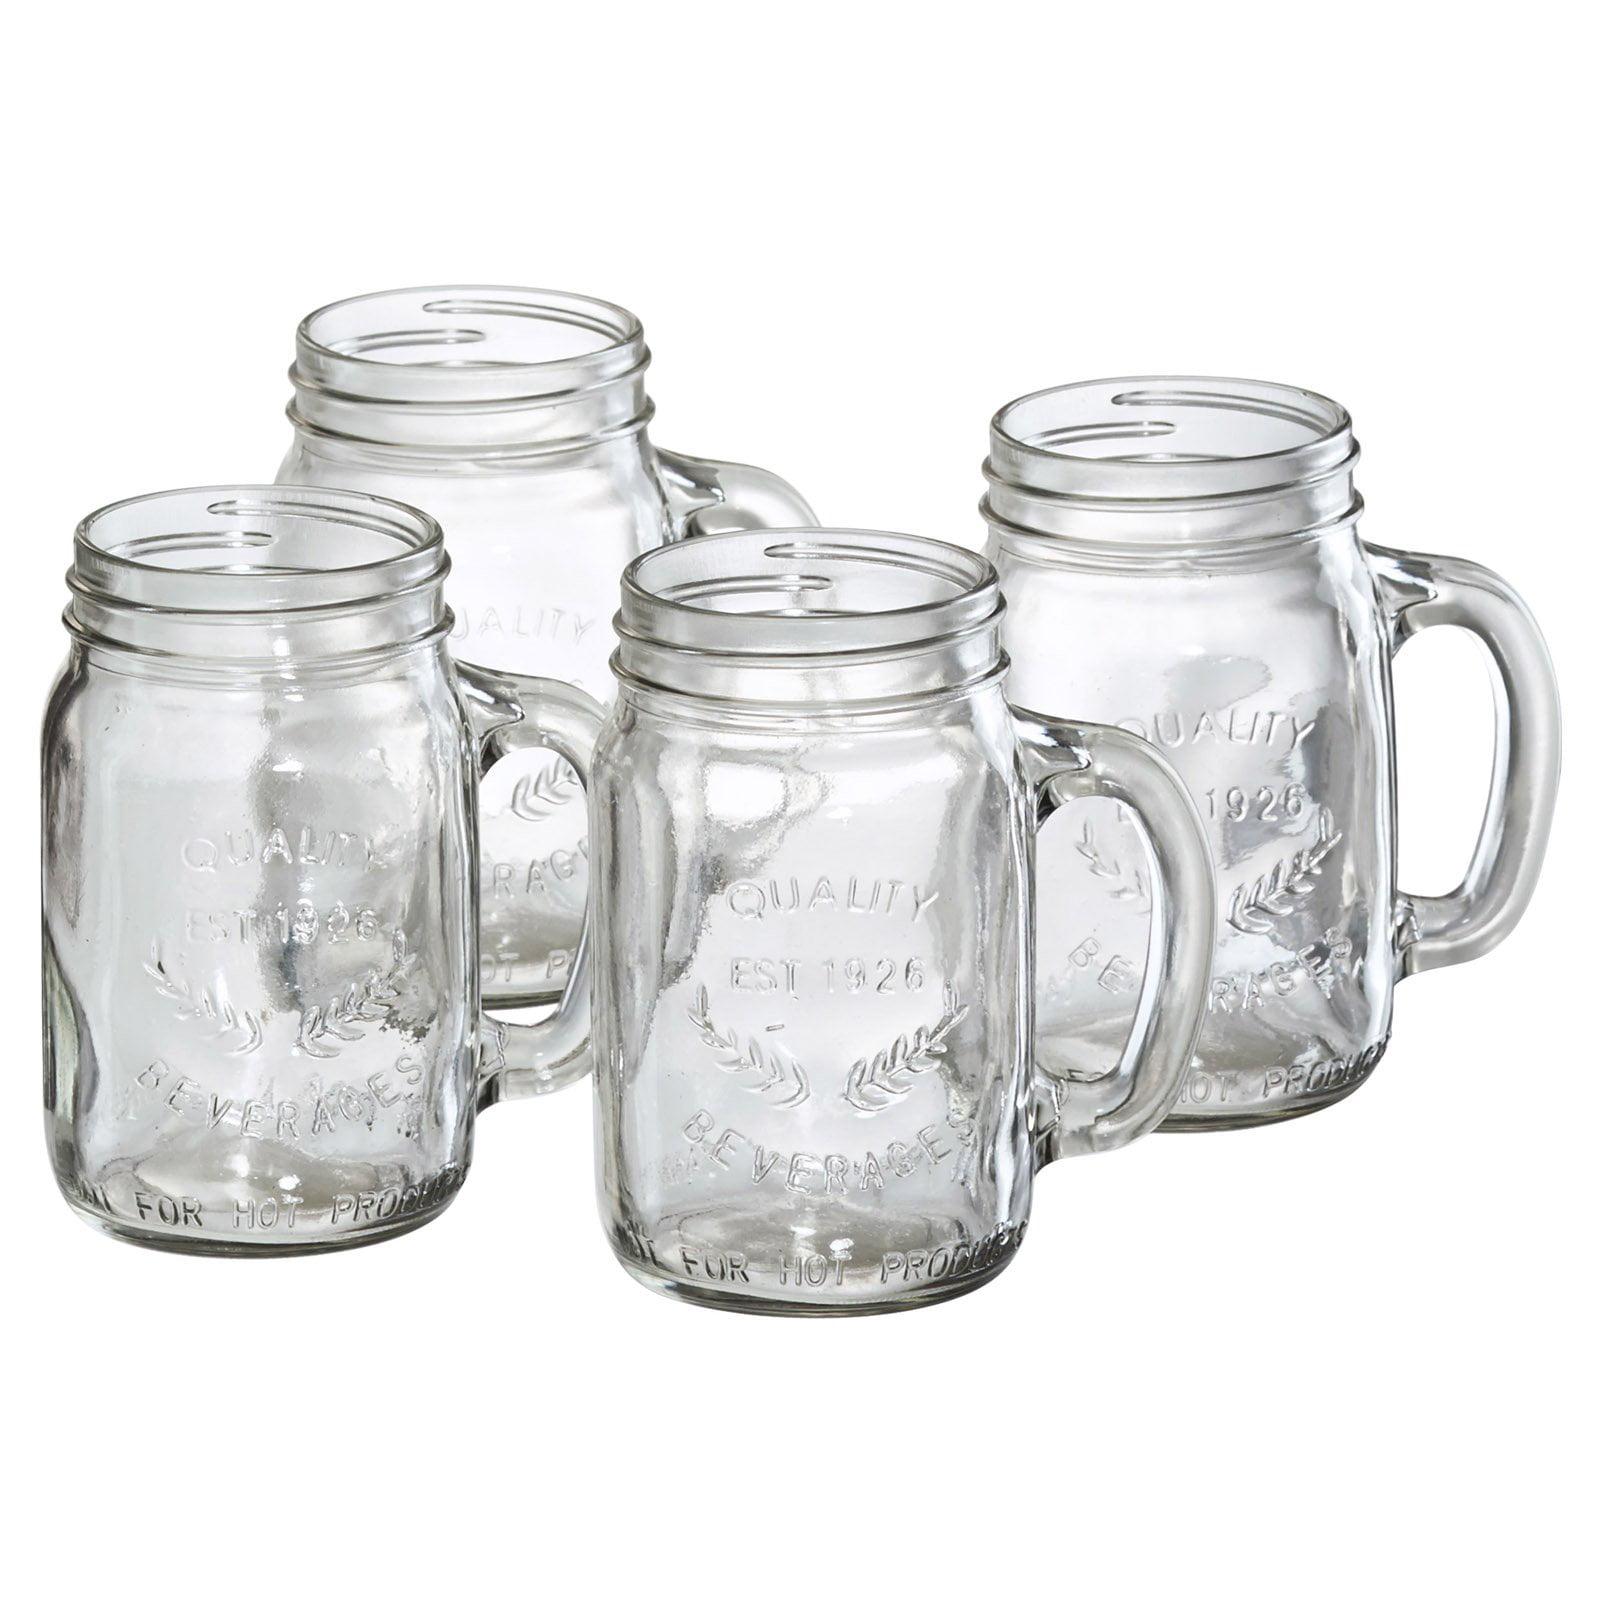 Artland Oasis Mason Jar with Handle - Set of 4